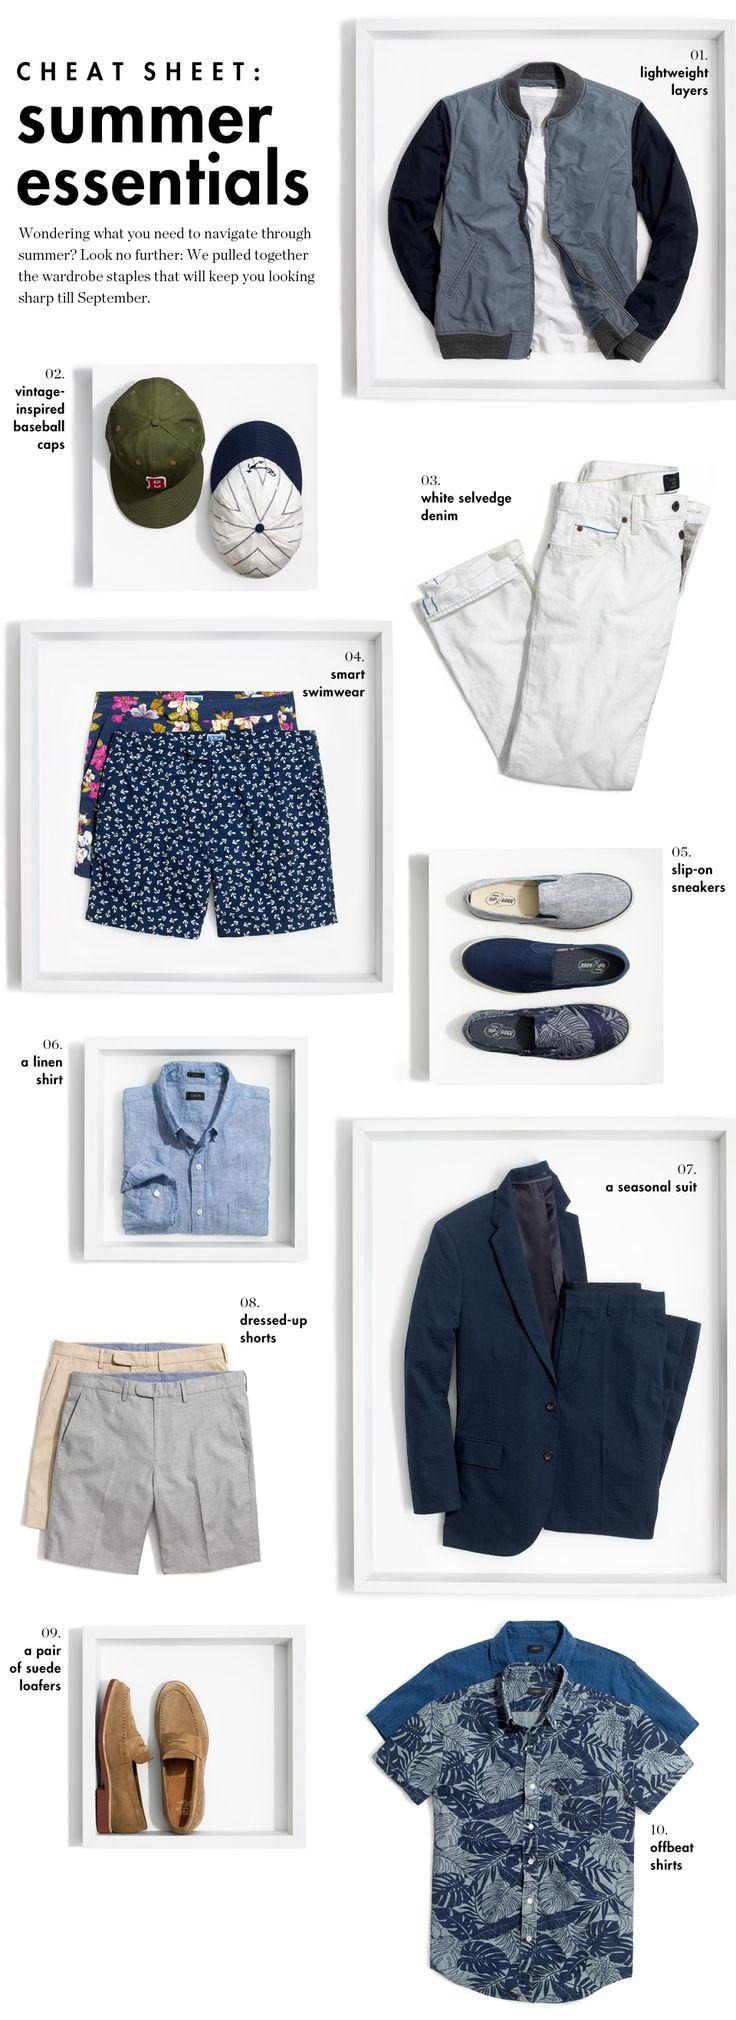 J.Crew Men's Clothing Cheat Sheet: Summer Essentials